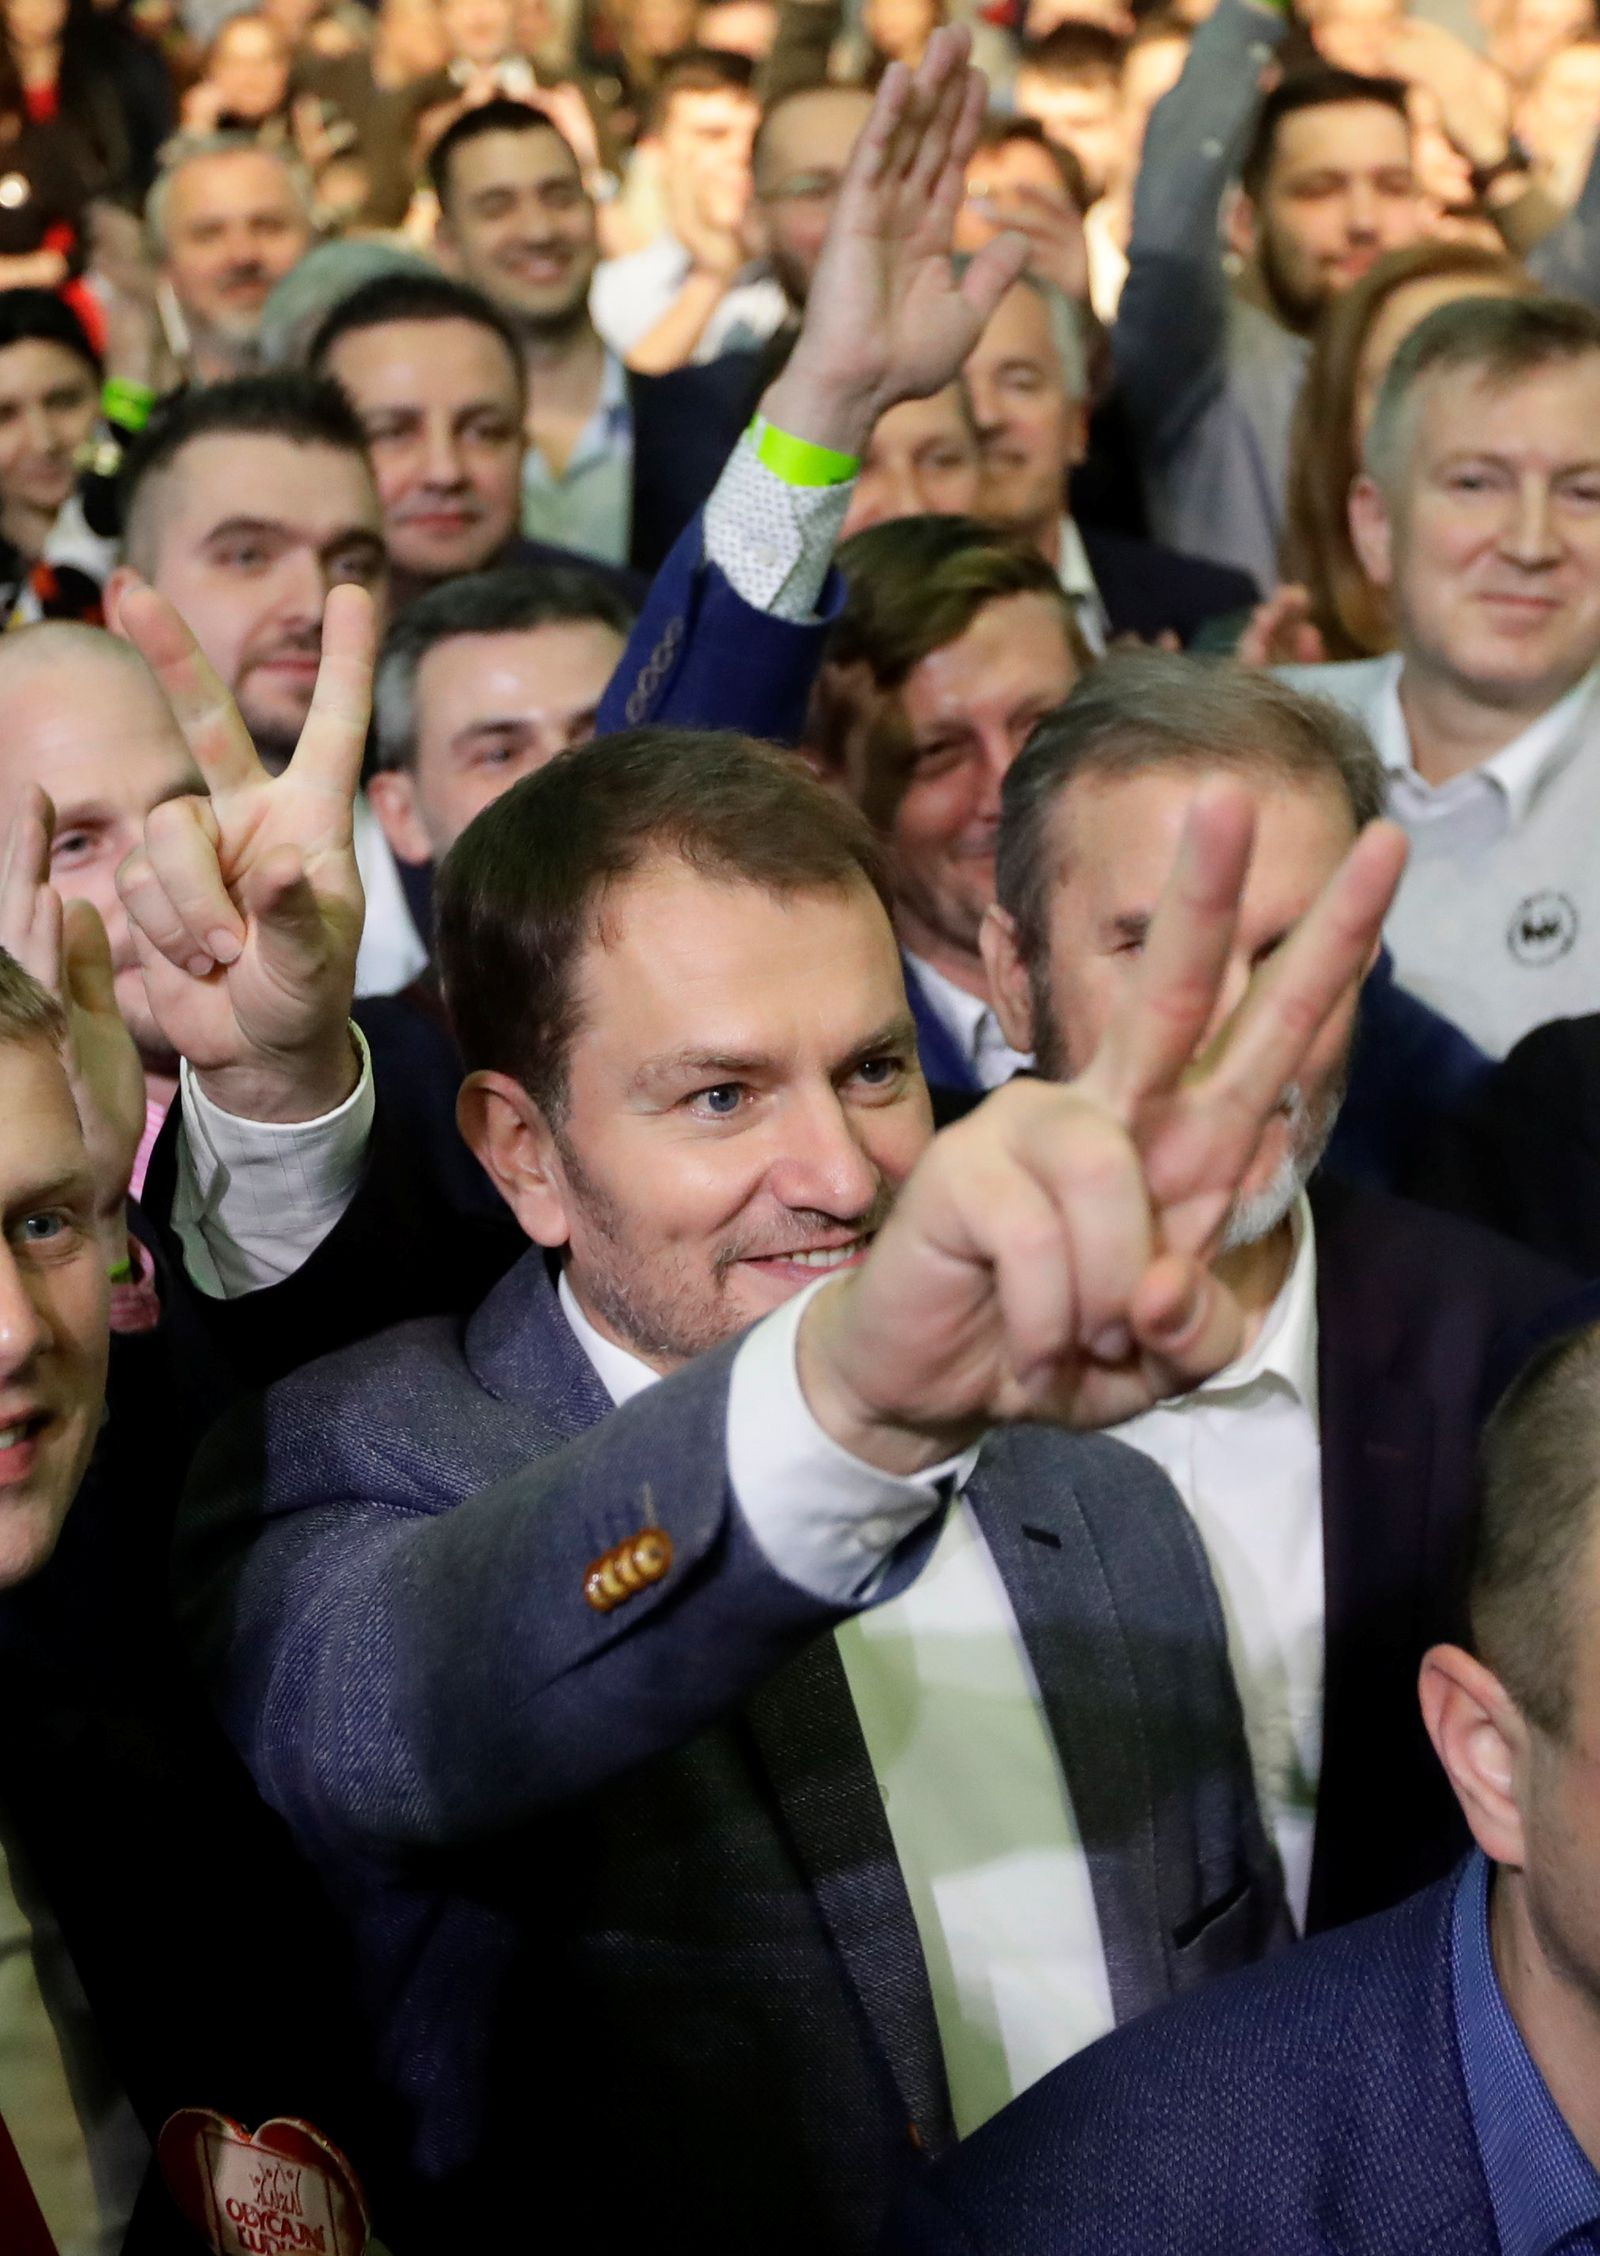 Parliamentary election in Slovakia